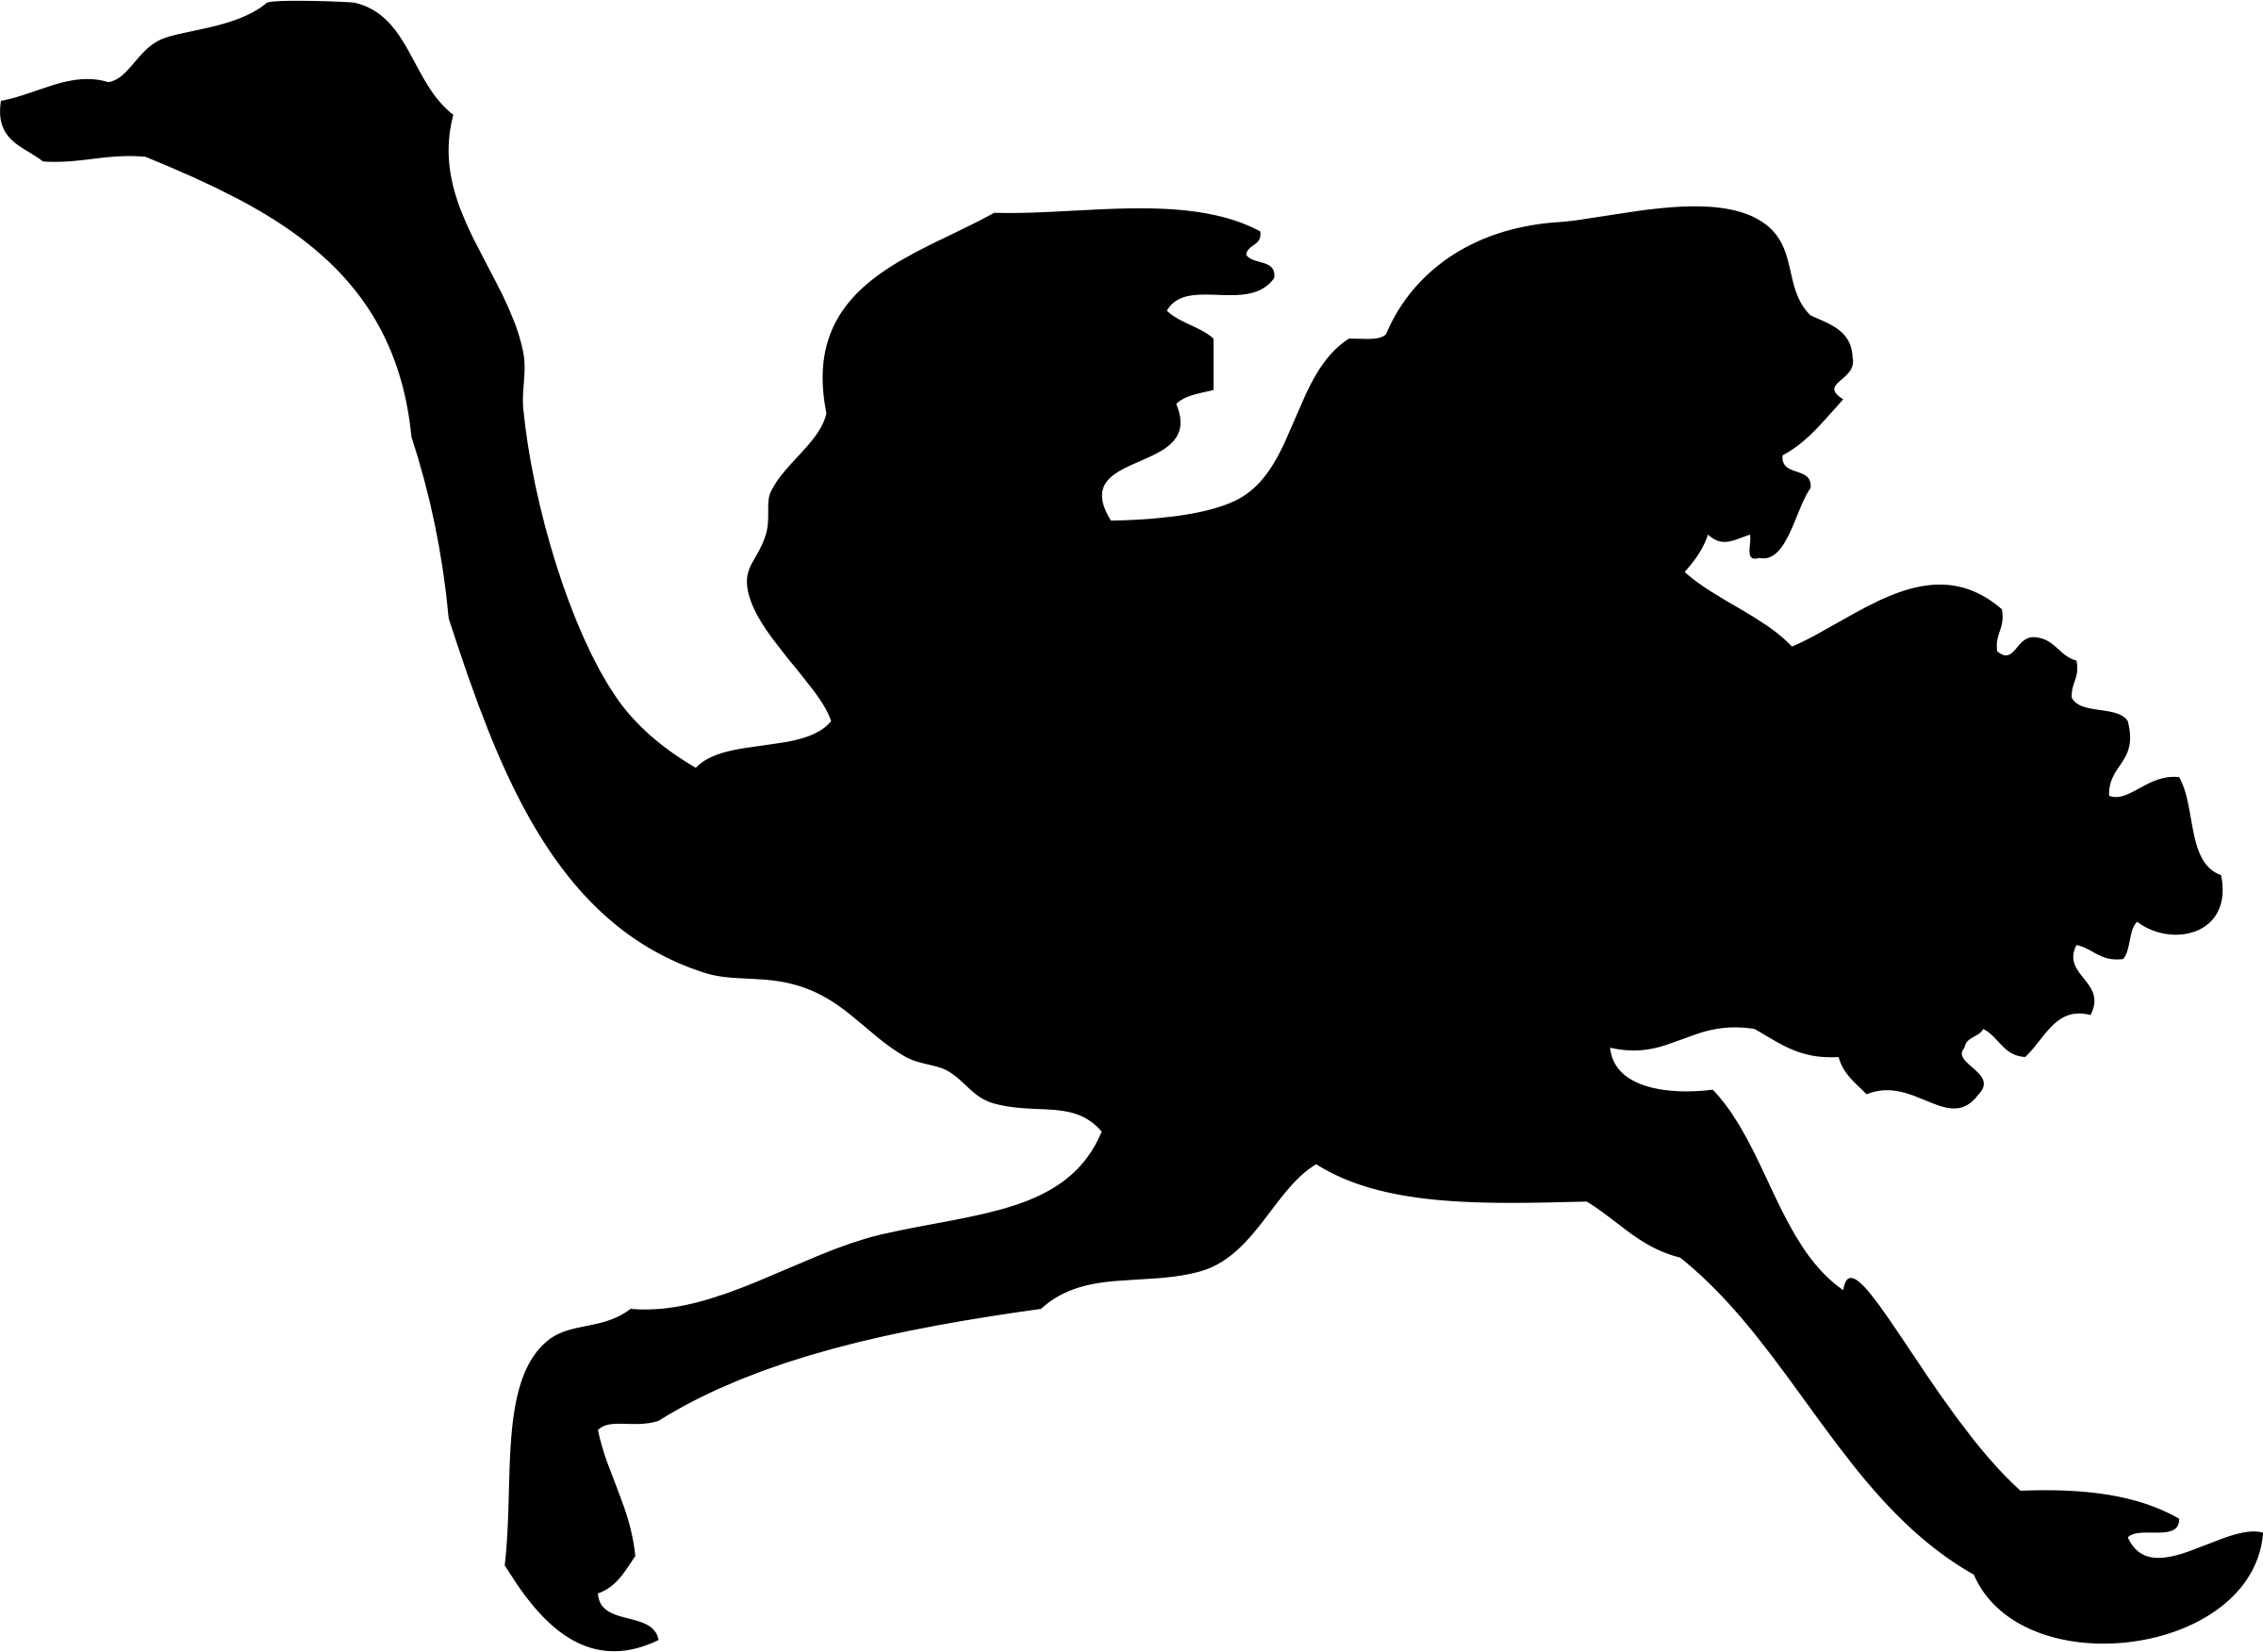 2400x1752 Clipart